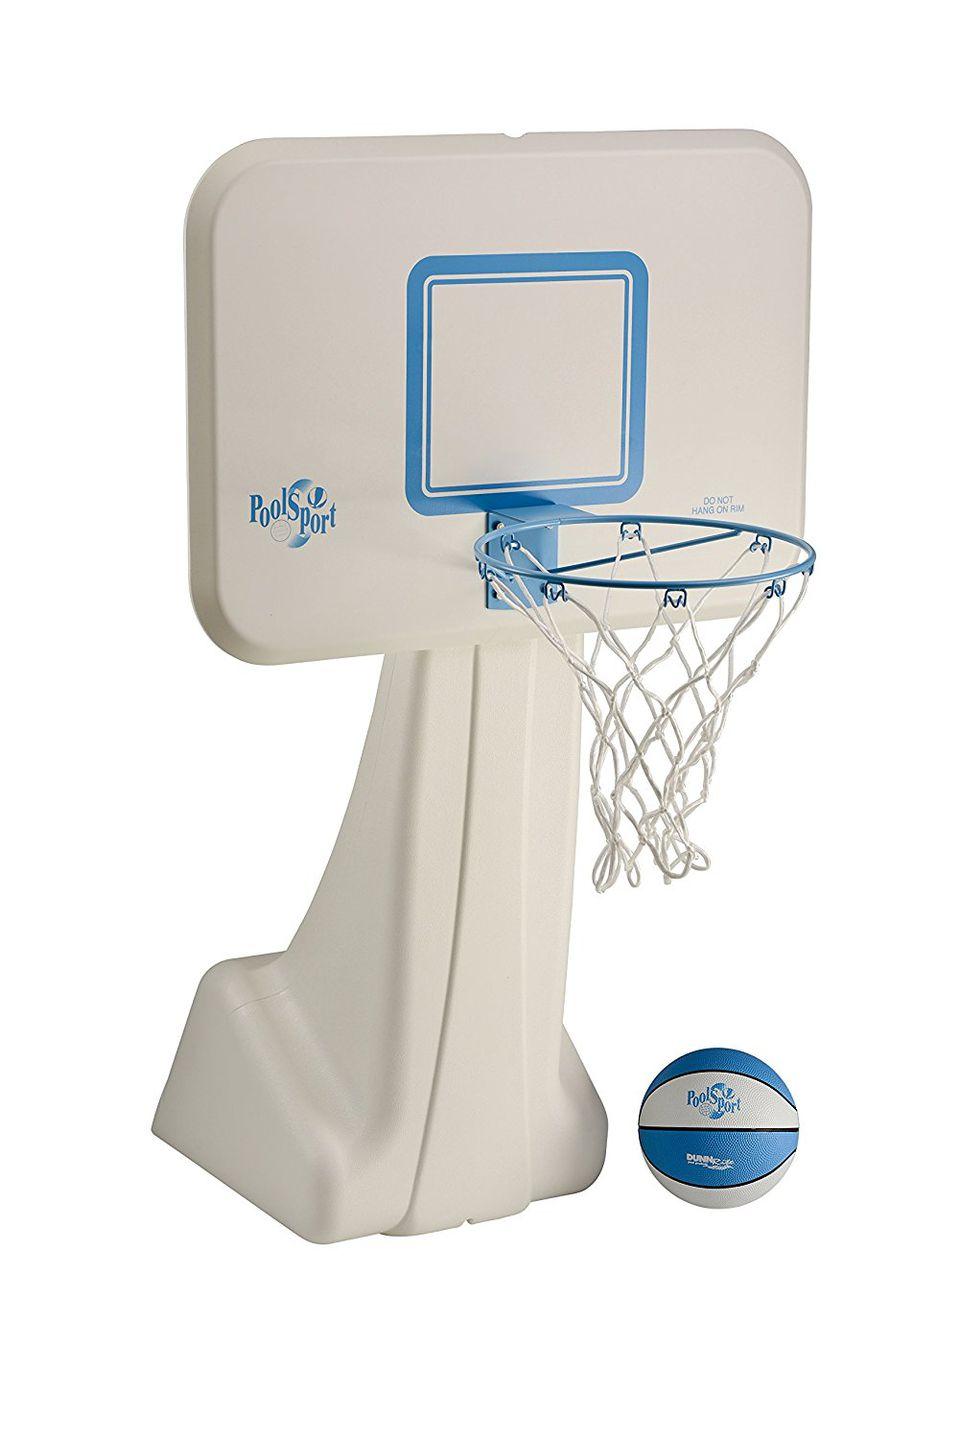 Dunnrite PoolSport pool basketball